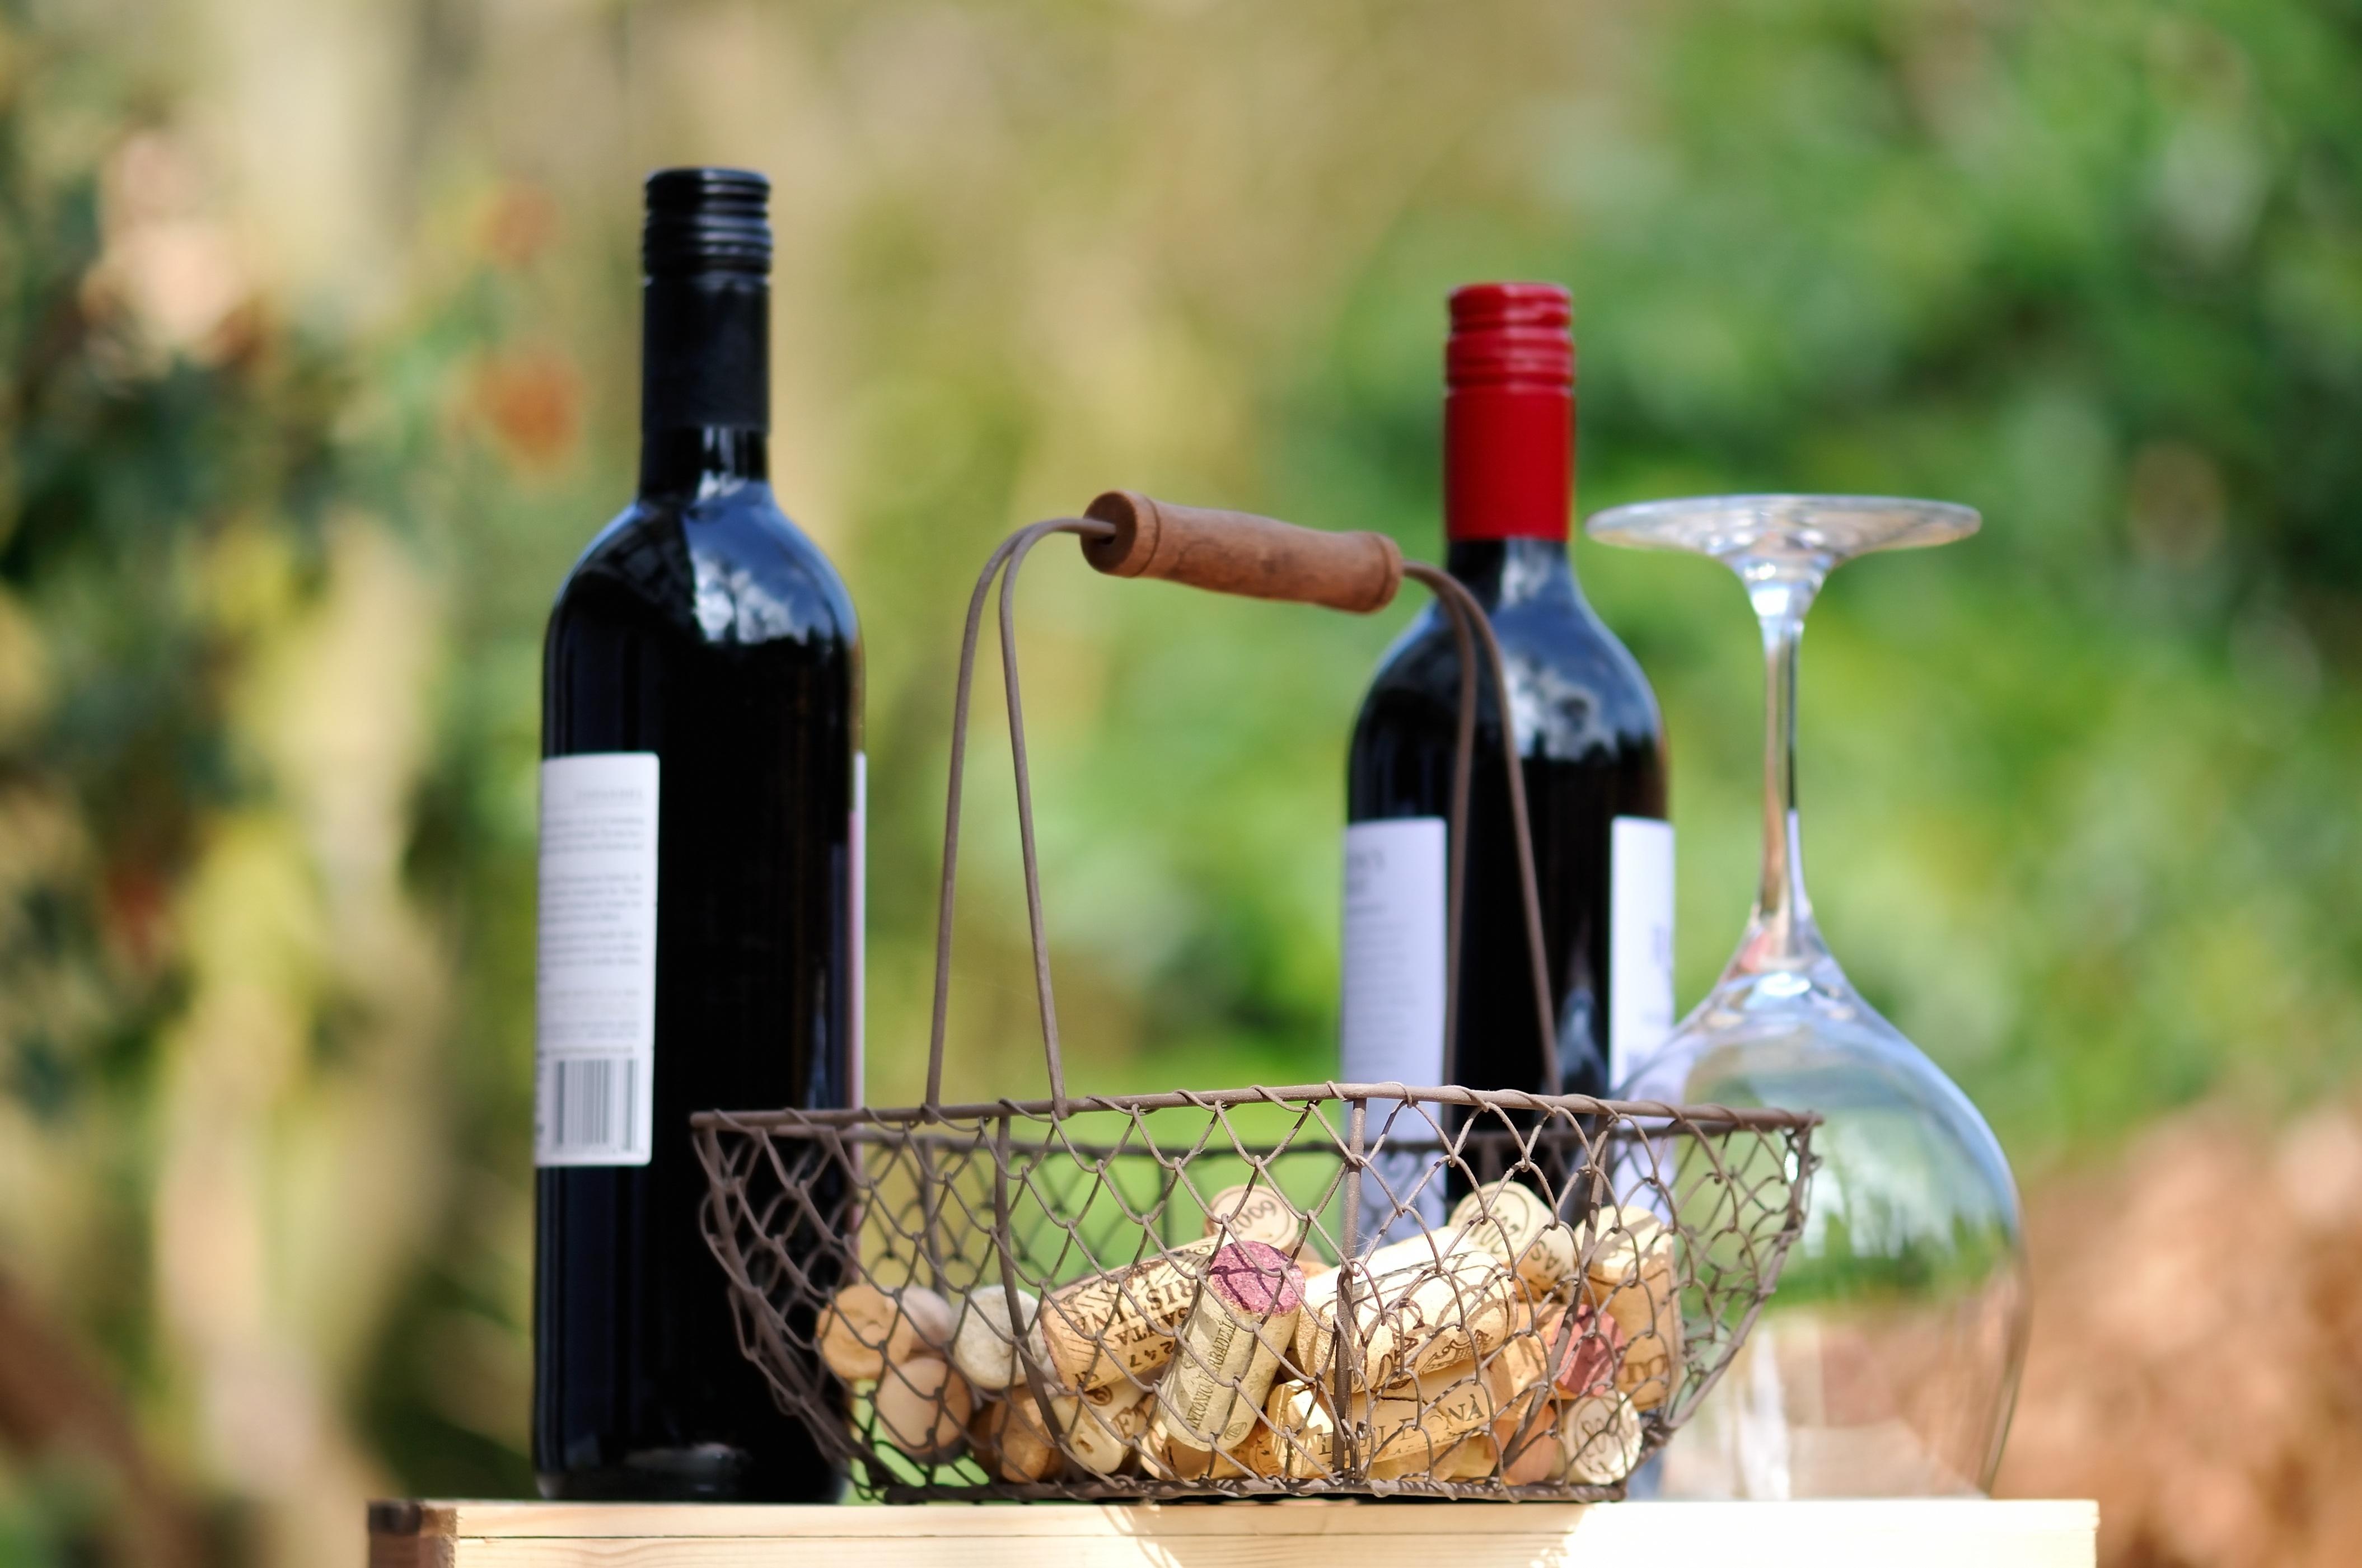 Free Images : liquid, summer, drink, garden, red wine, delicious ...